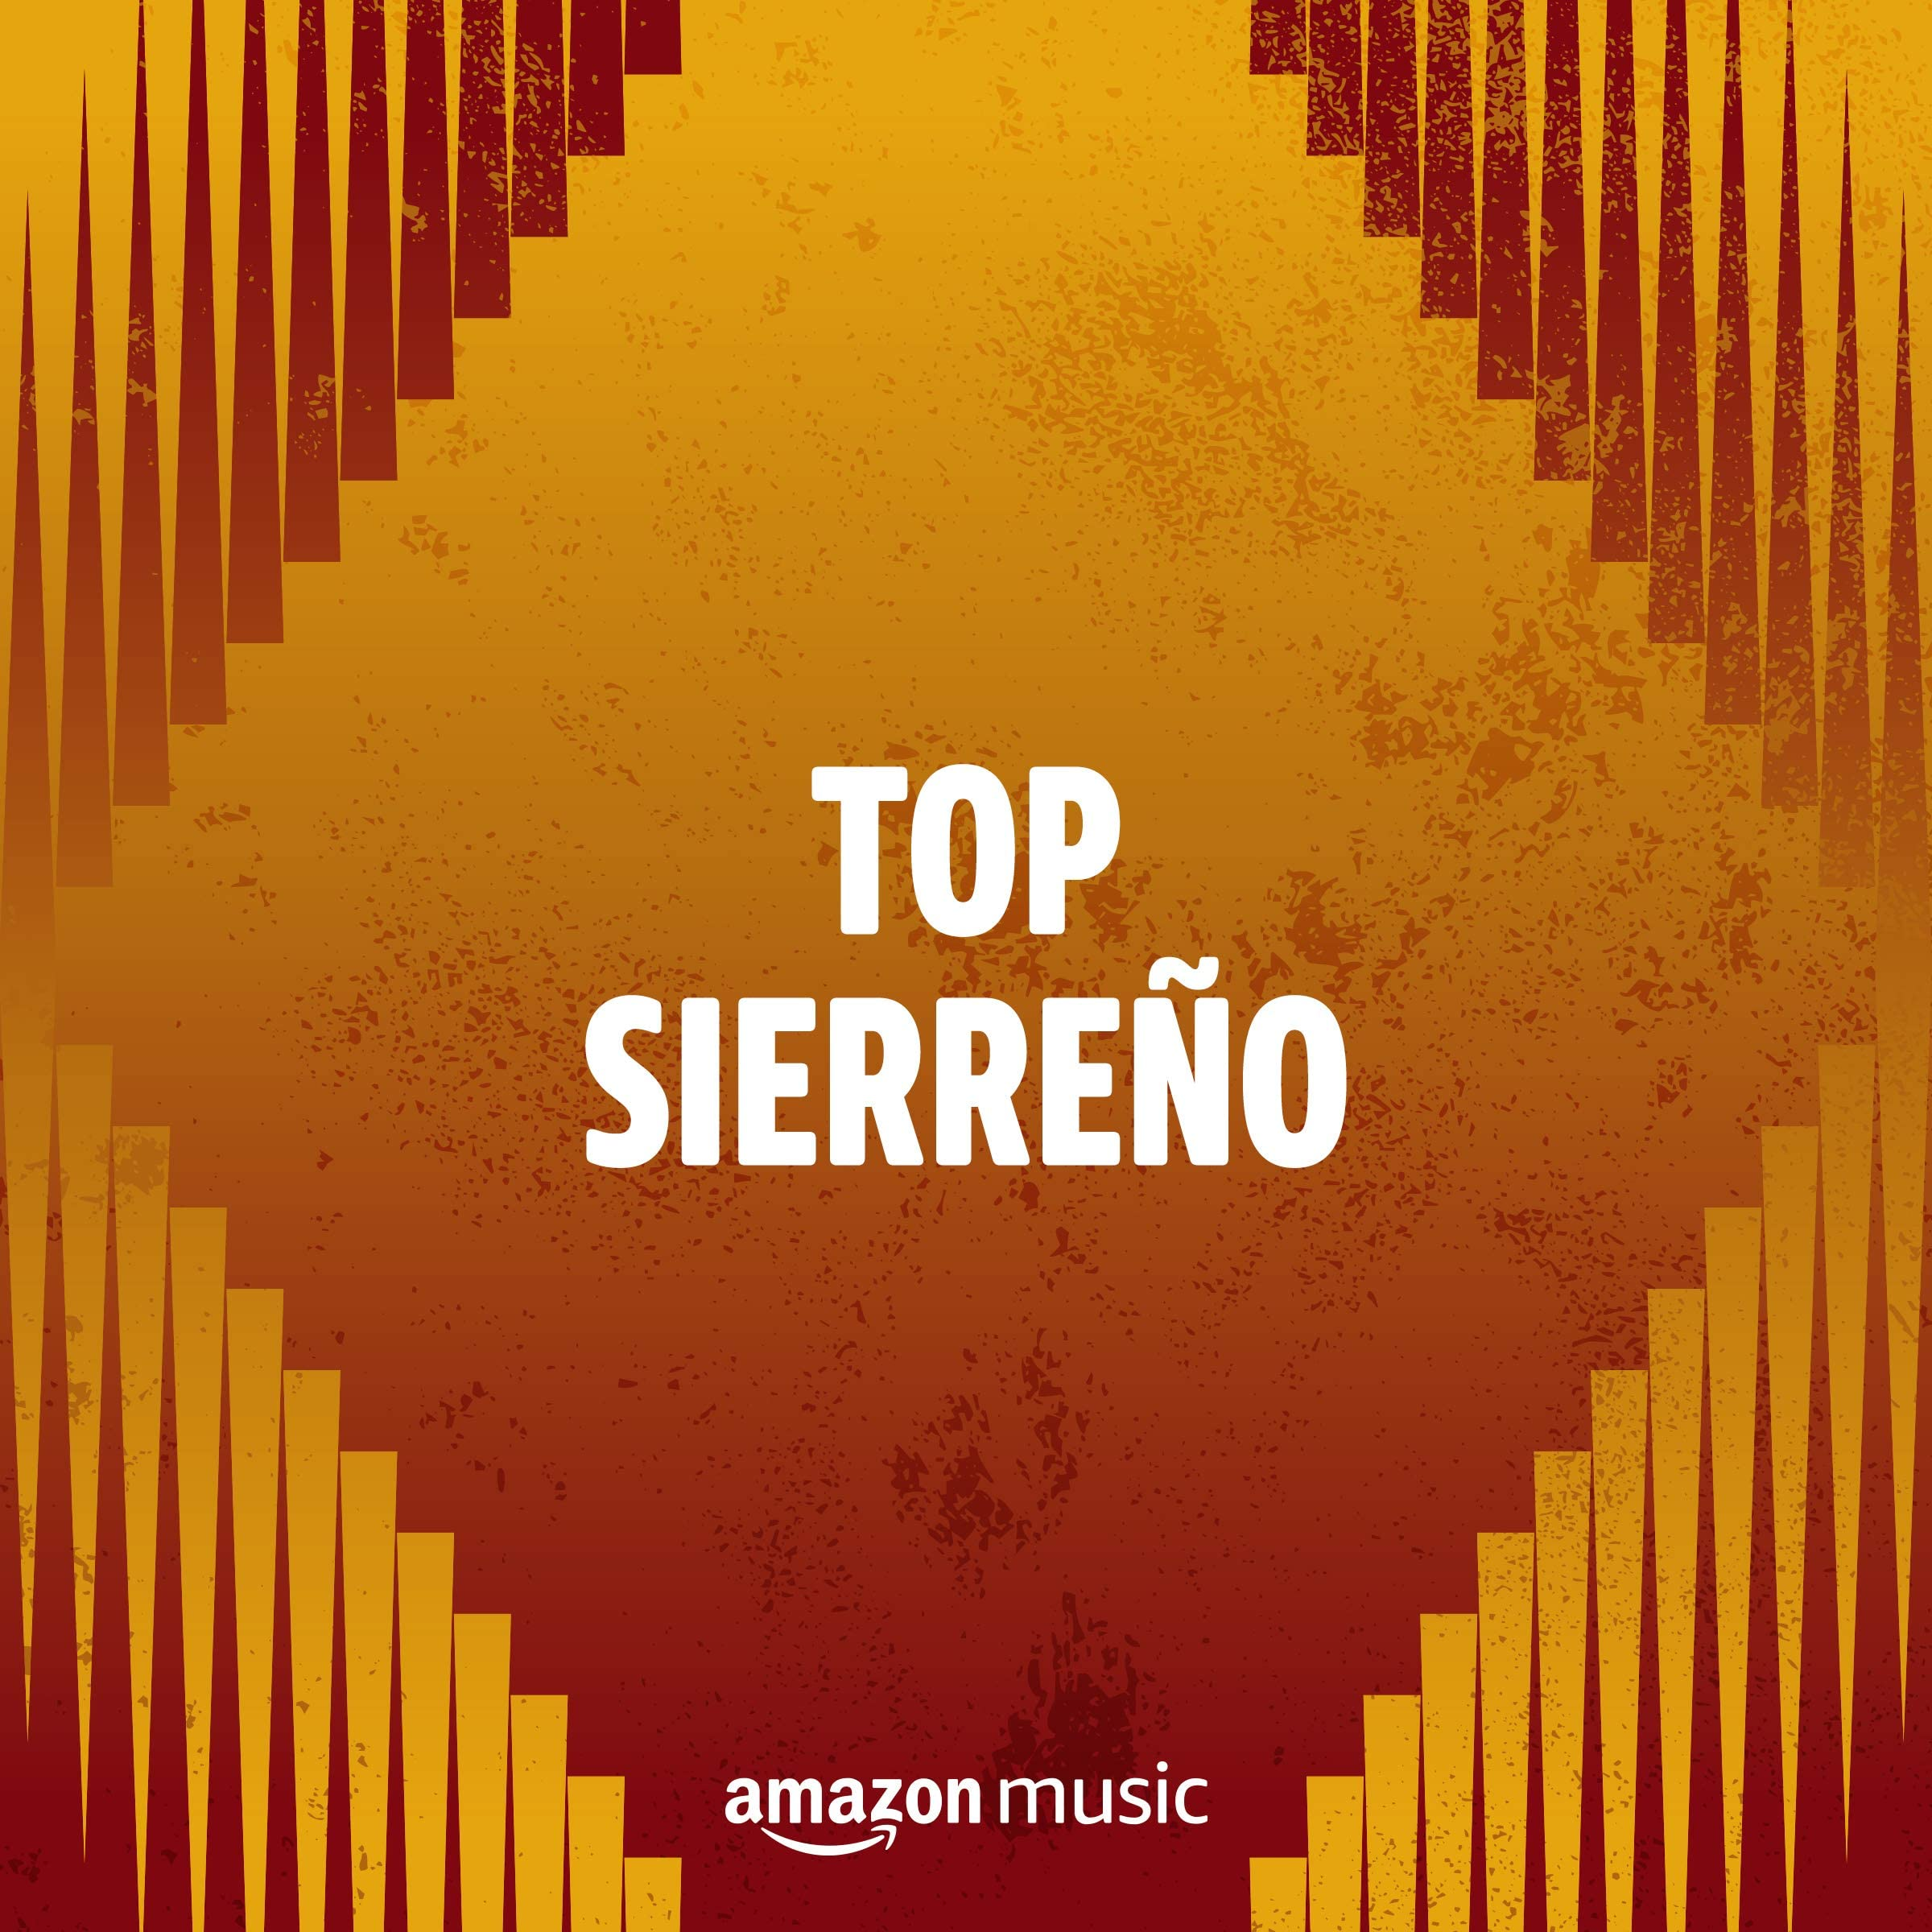 Top Sierreño